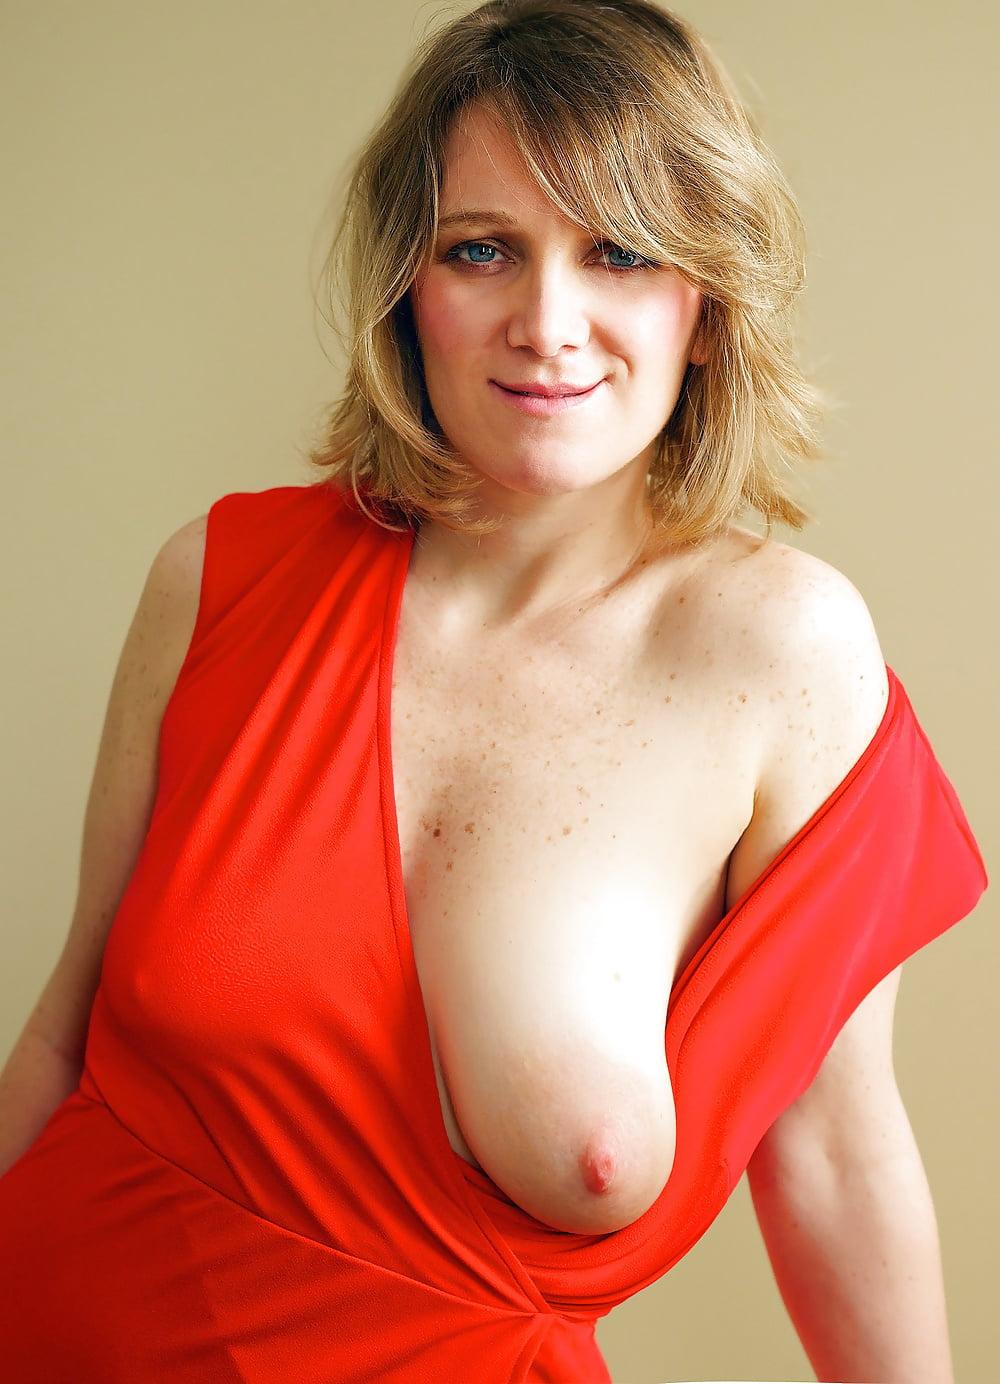 Floppy Saggy Puffy Nipples Braless 7 - 21 Pics  Xhamster-7495